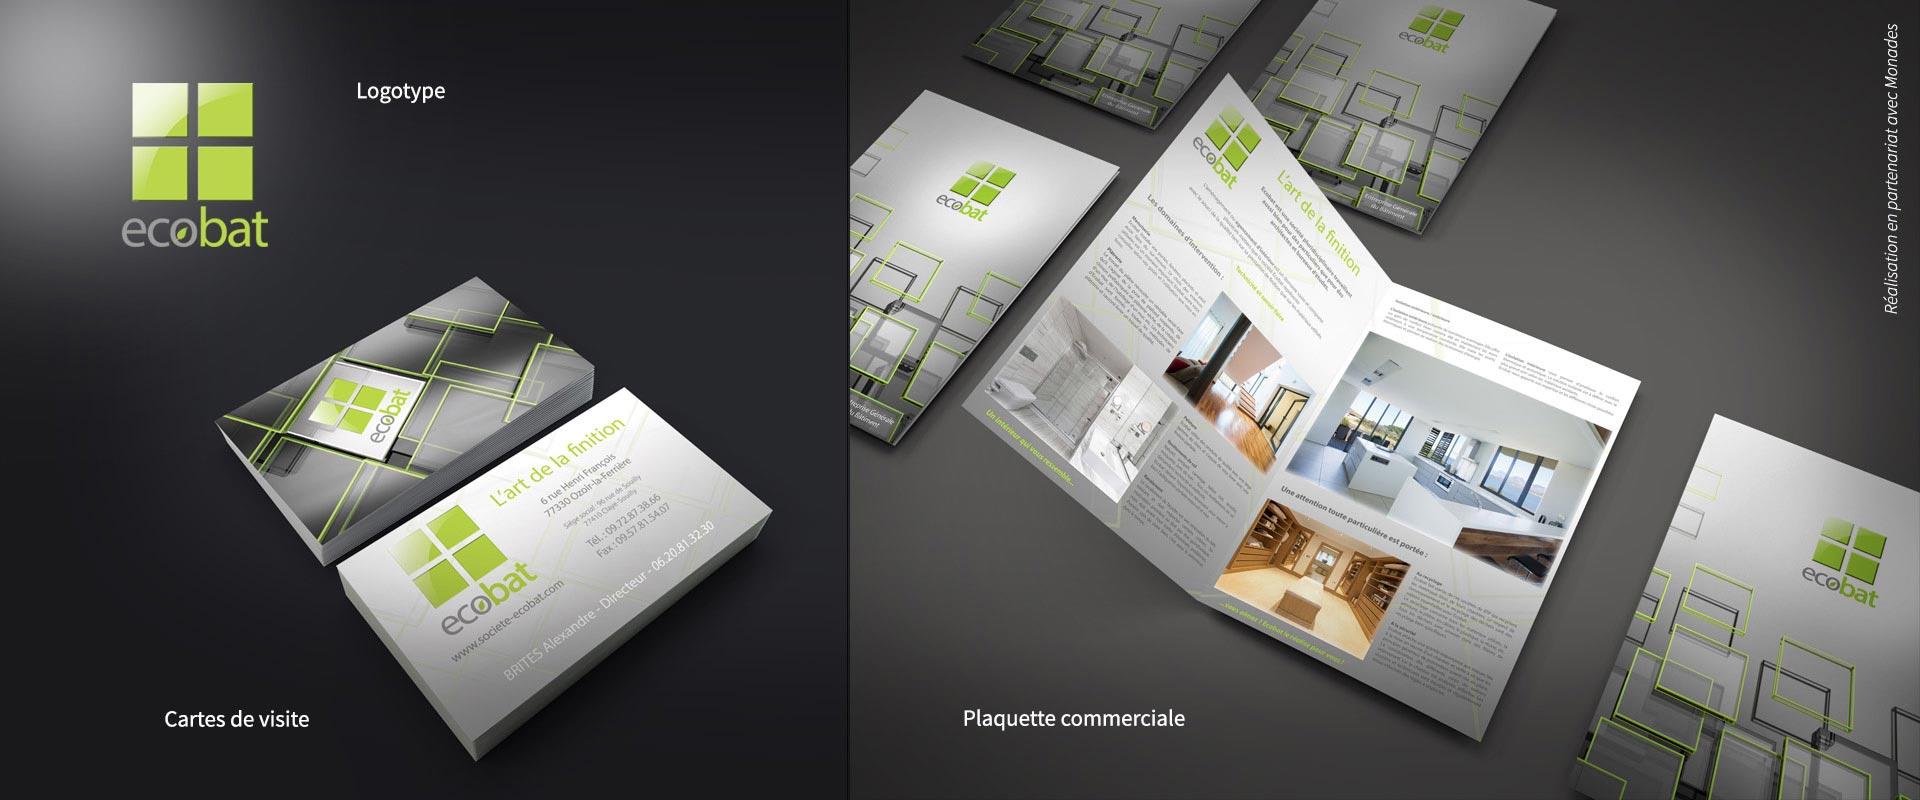 ref-Ecobat-Infographie-Netbinder